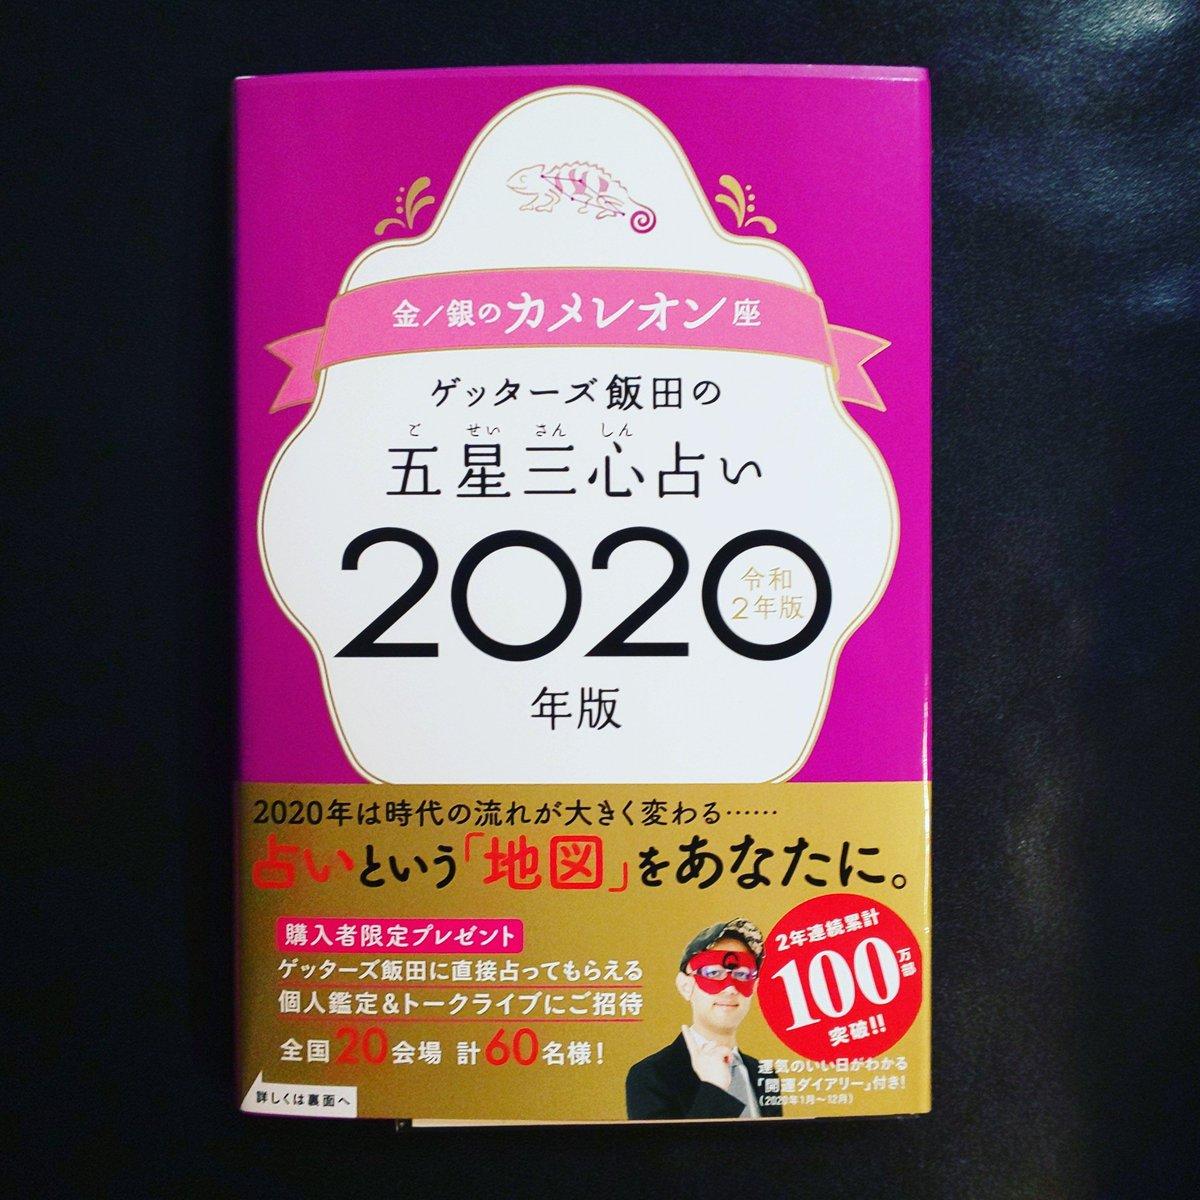 2020 ゲッターズ飯田 予言 ゲッターズ飯田のコロナ予言|obatea占い|note